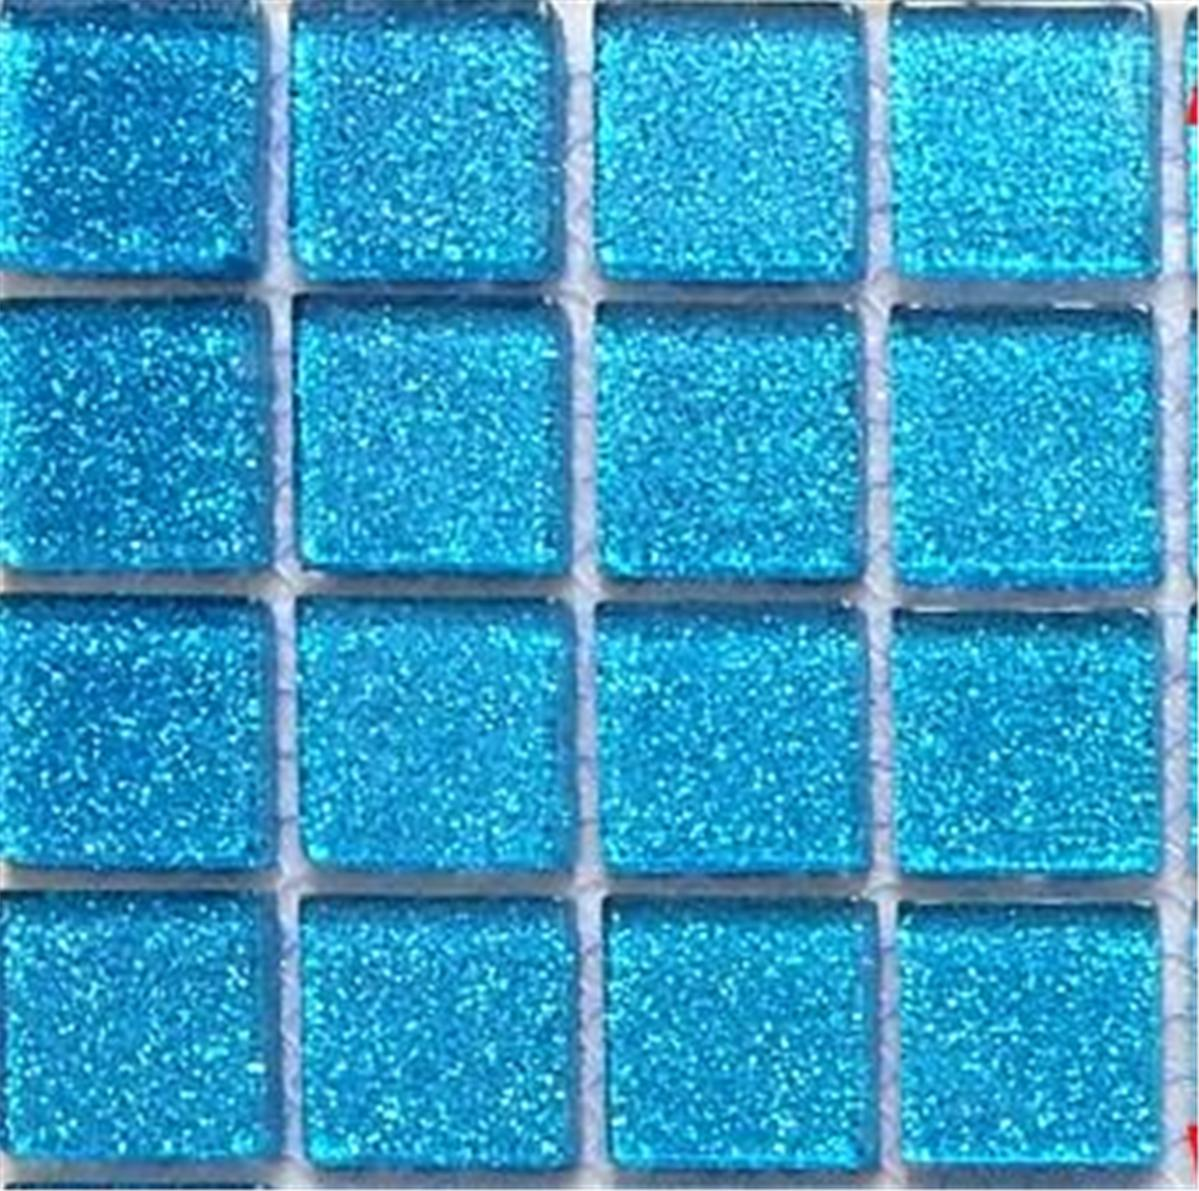 Bathroom Tiles Mosaic Border: Mosaic Tiles Glass Glitter Blue Bathroom Kitchen Walls